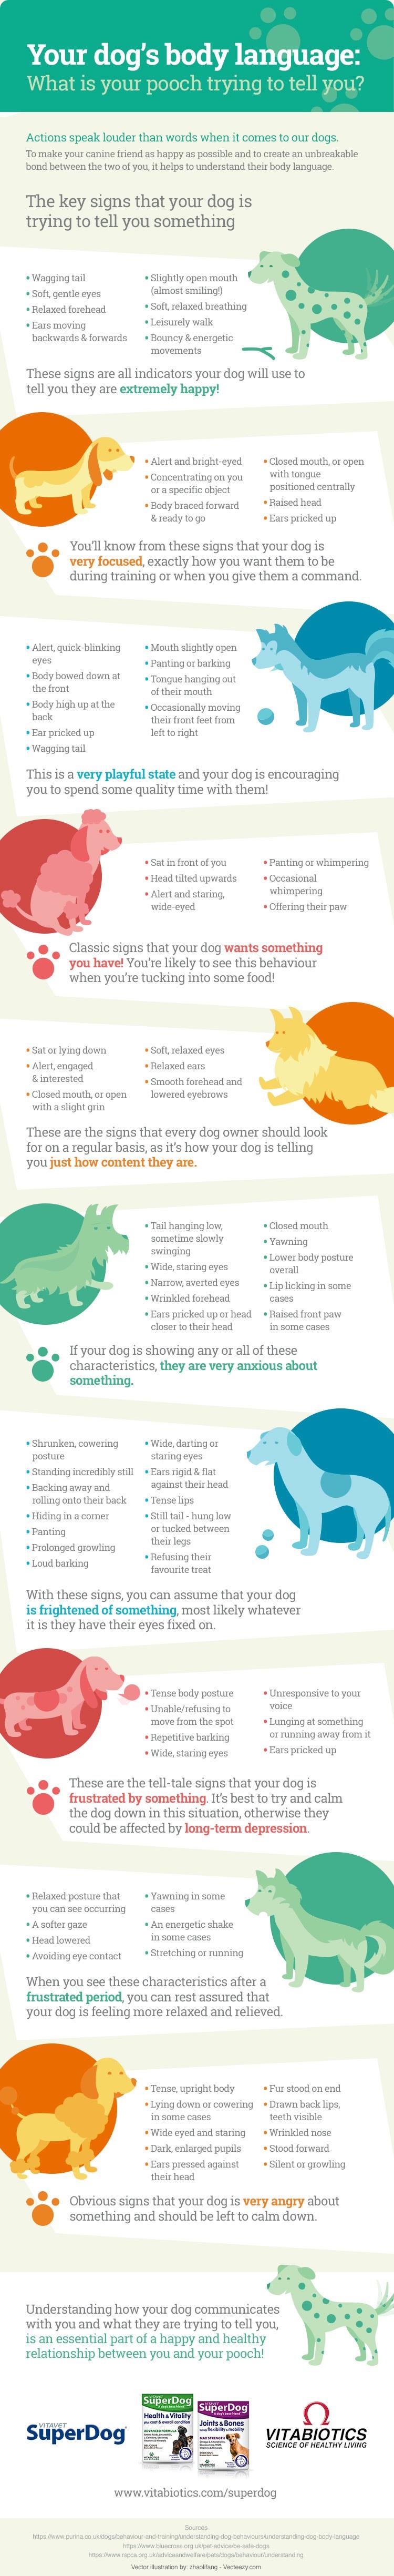 Vitabiotics Dog Body Language Infographic